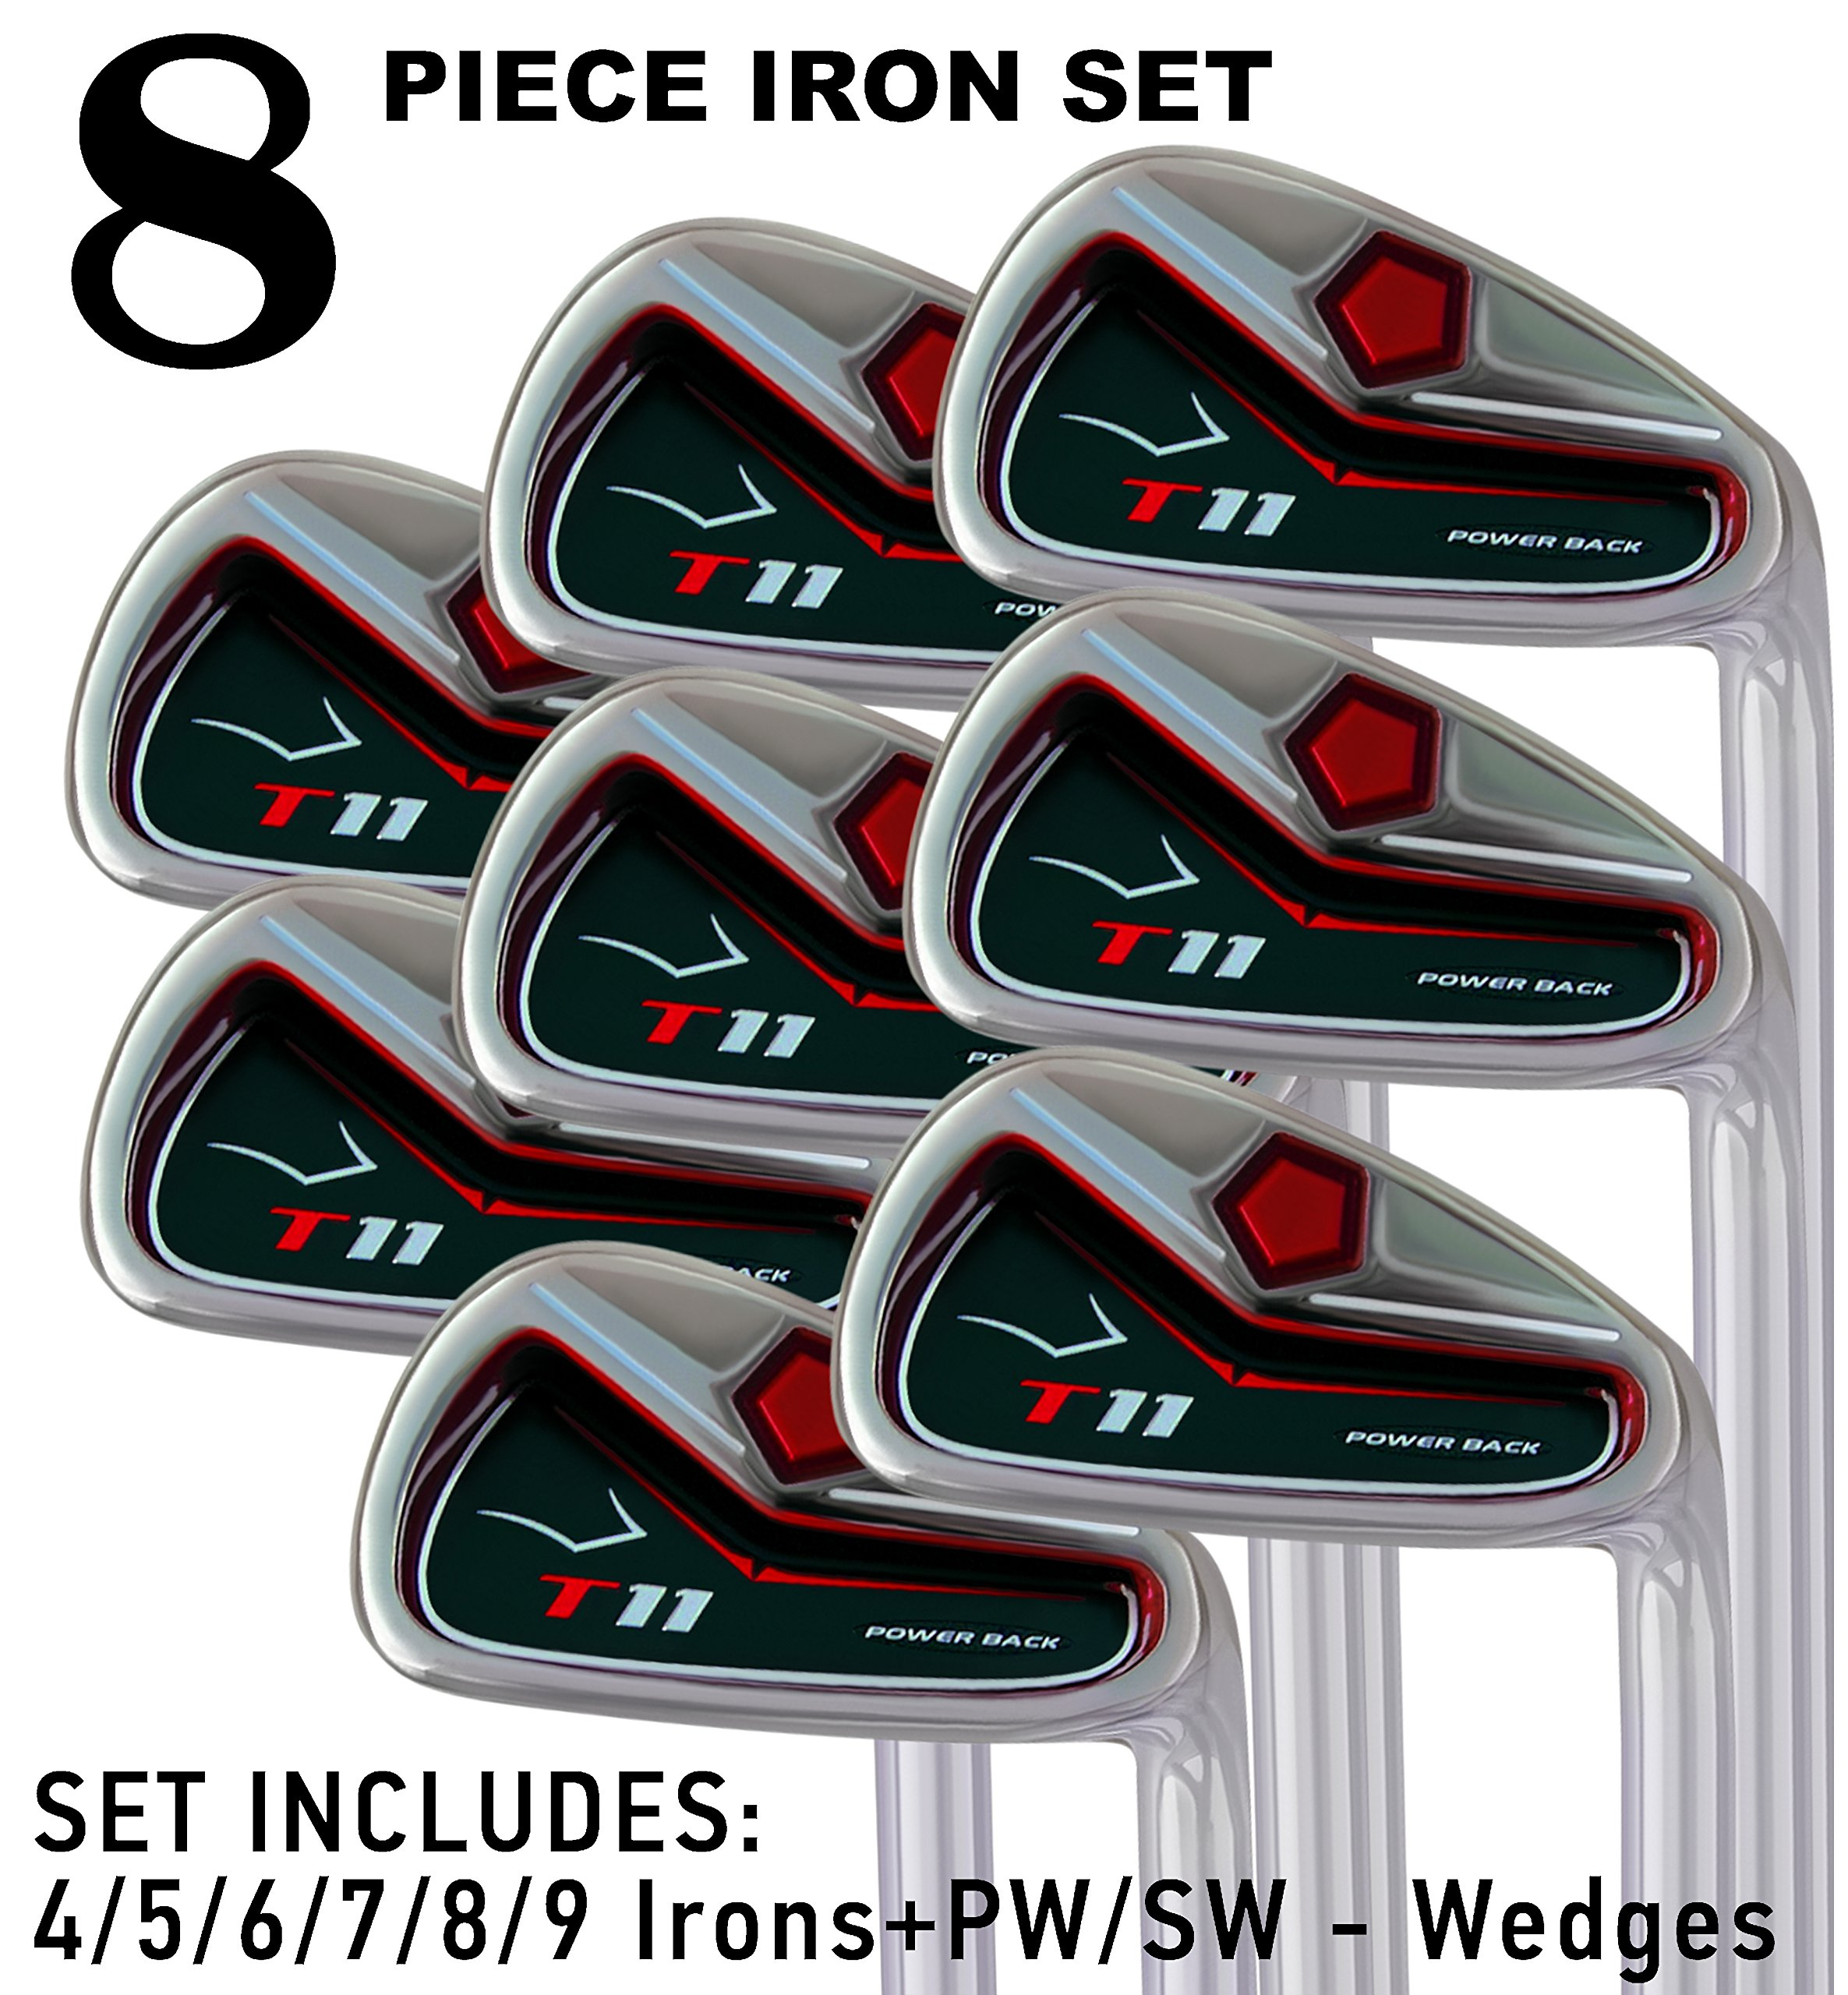 T11 Power Back Iron Set 4-SW Custom Made Golf Clubs Right Hand Regular R Flex Steel Shafts Men's Standard Irons by Pacific Golf Clubs